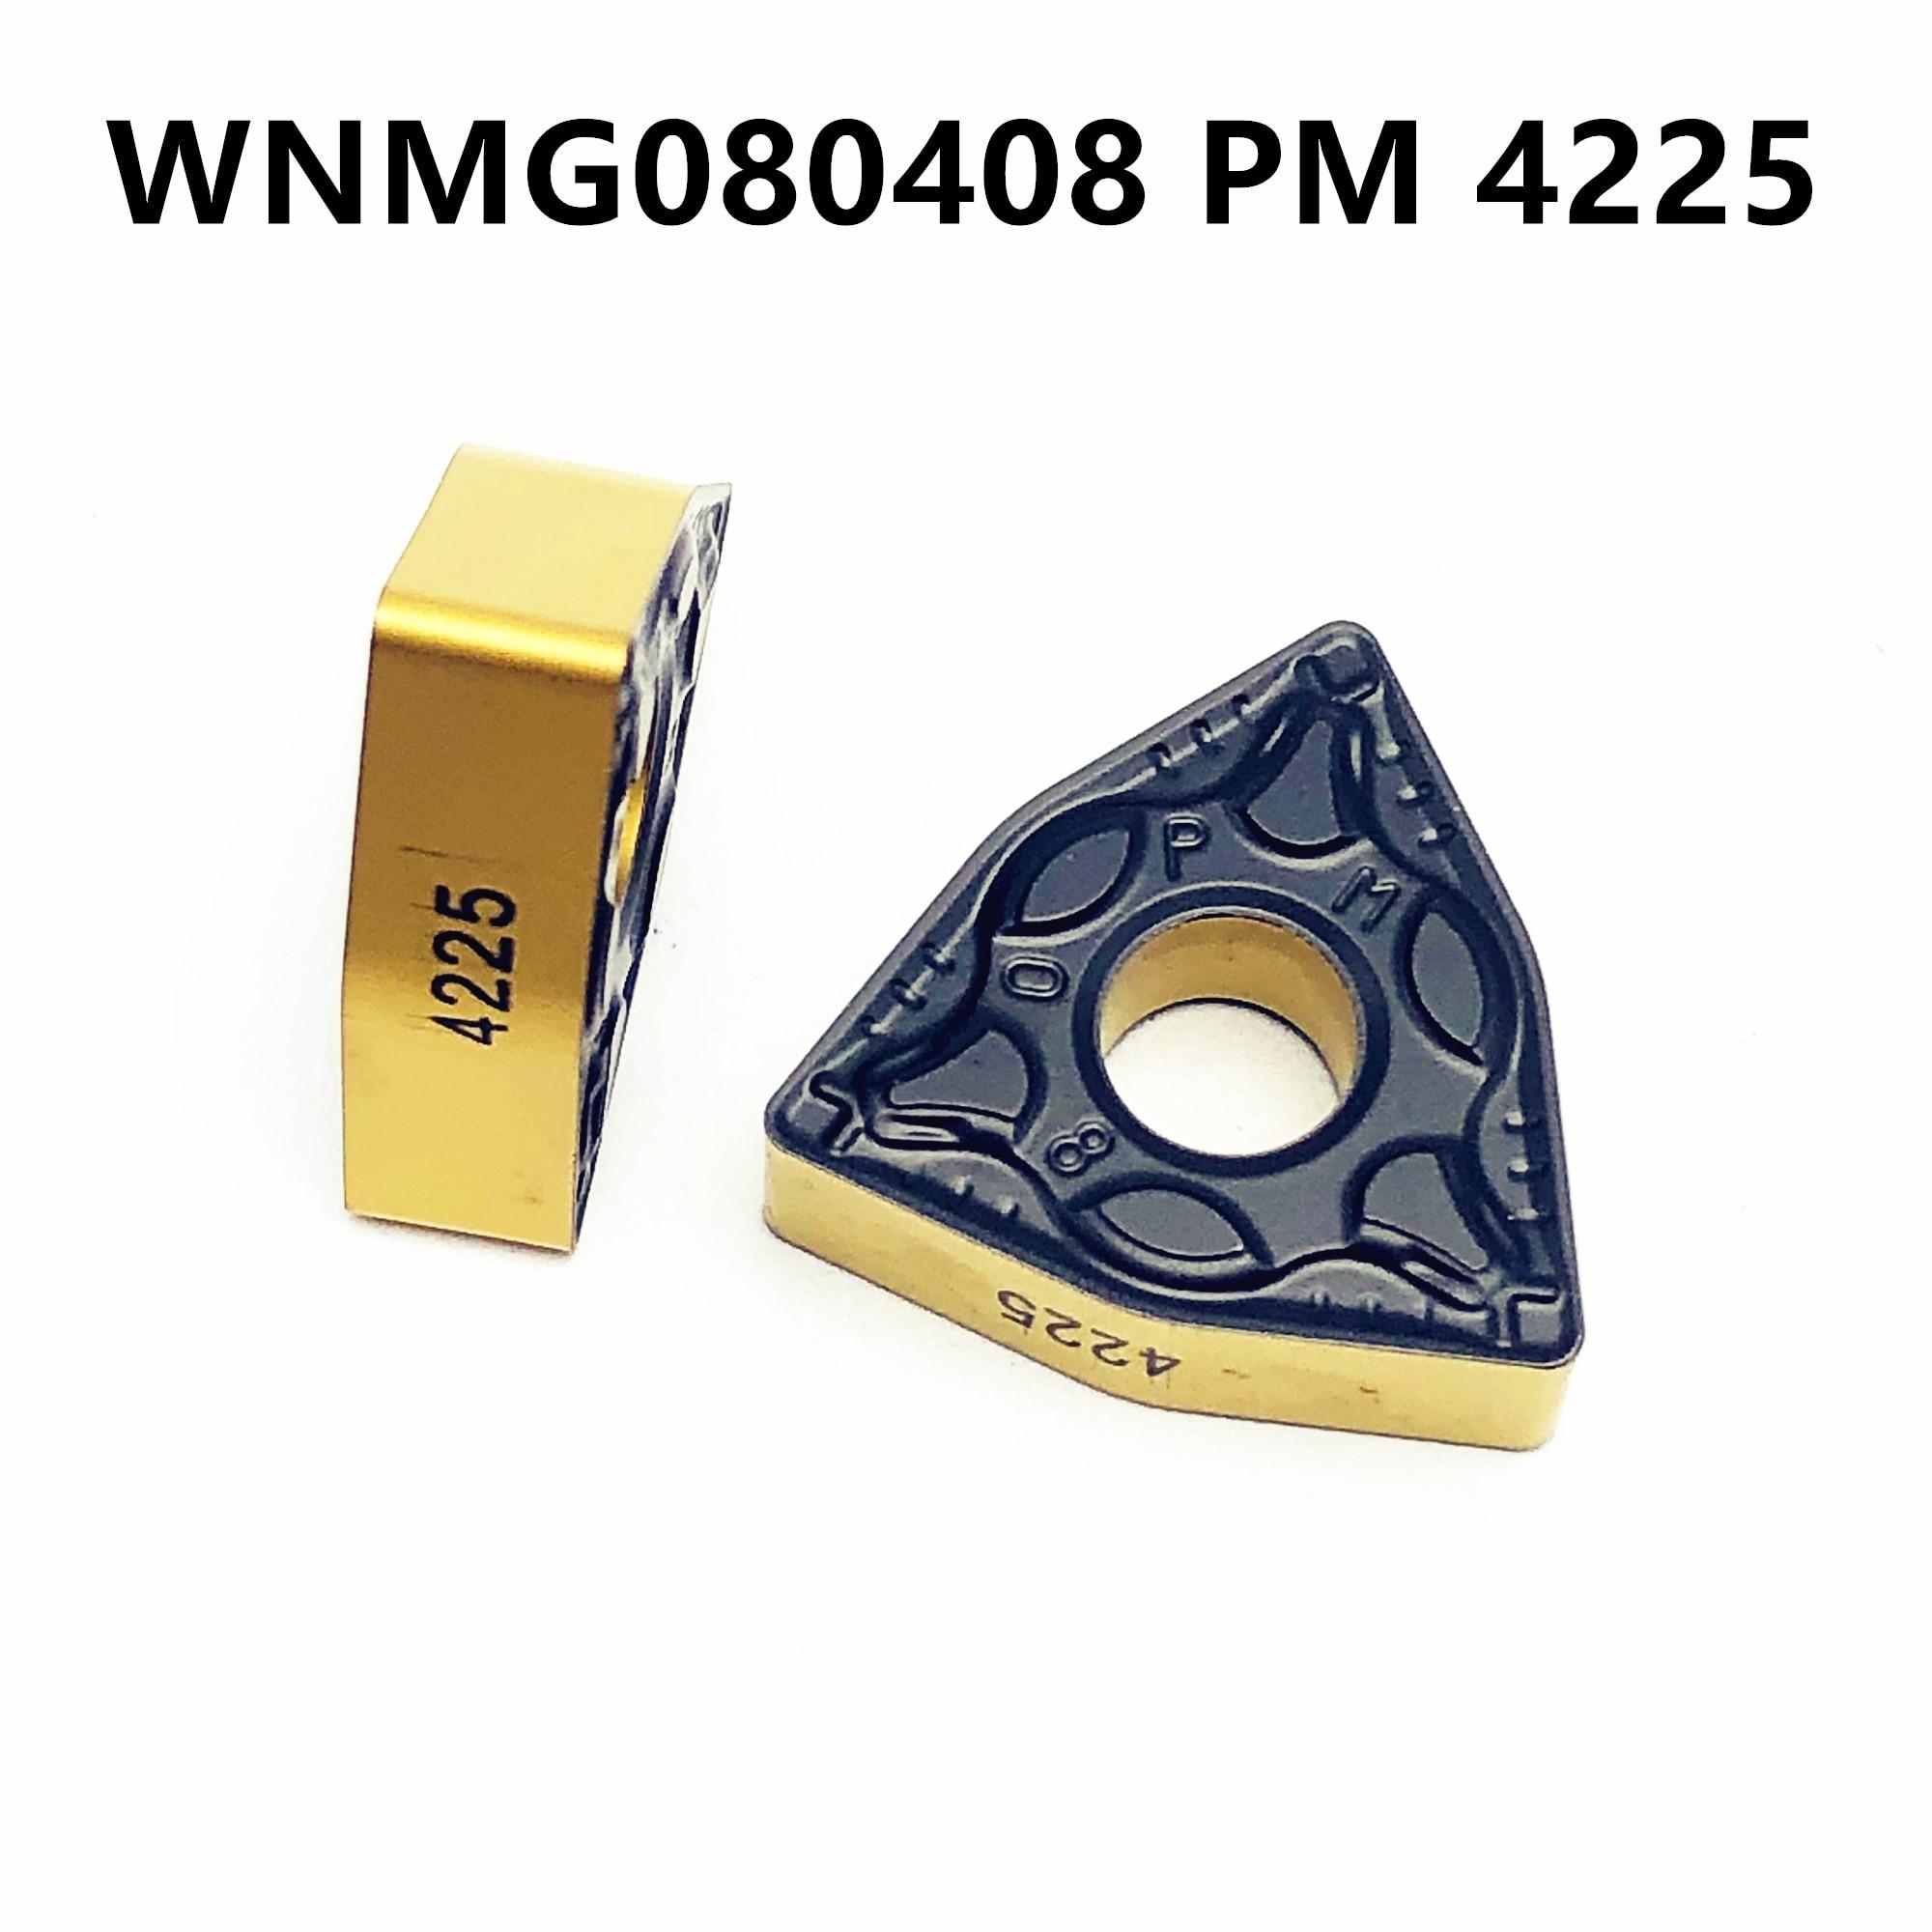 10PCS WNMG080408 PM 4225 Carbide Insert High Quality Cylindrical Lathe Tool CNC Lathe Tool Tokarnyy WNMG 080408 Pm4225